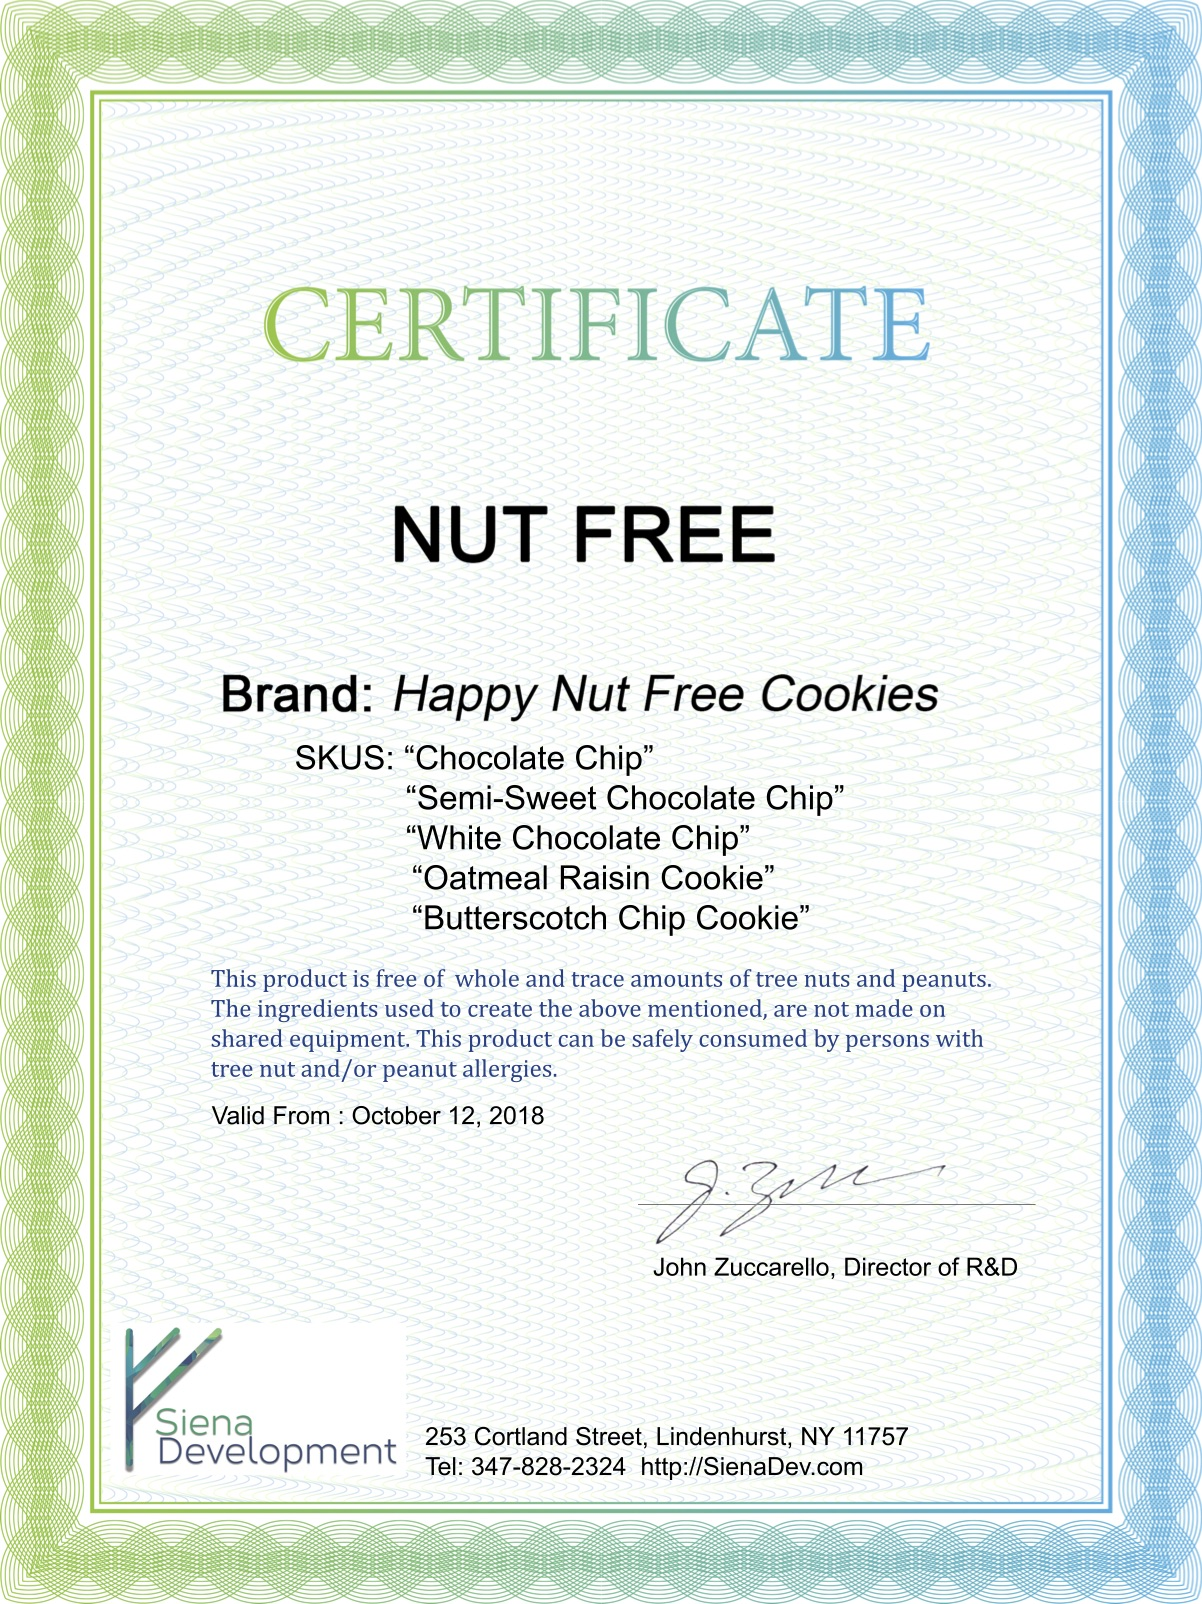 Nut Free Cert_Christa Stephens_Updated-FINAL copy jpg.jpg